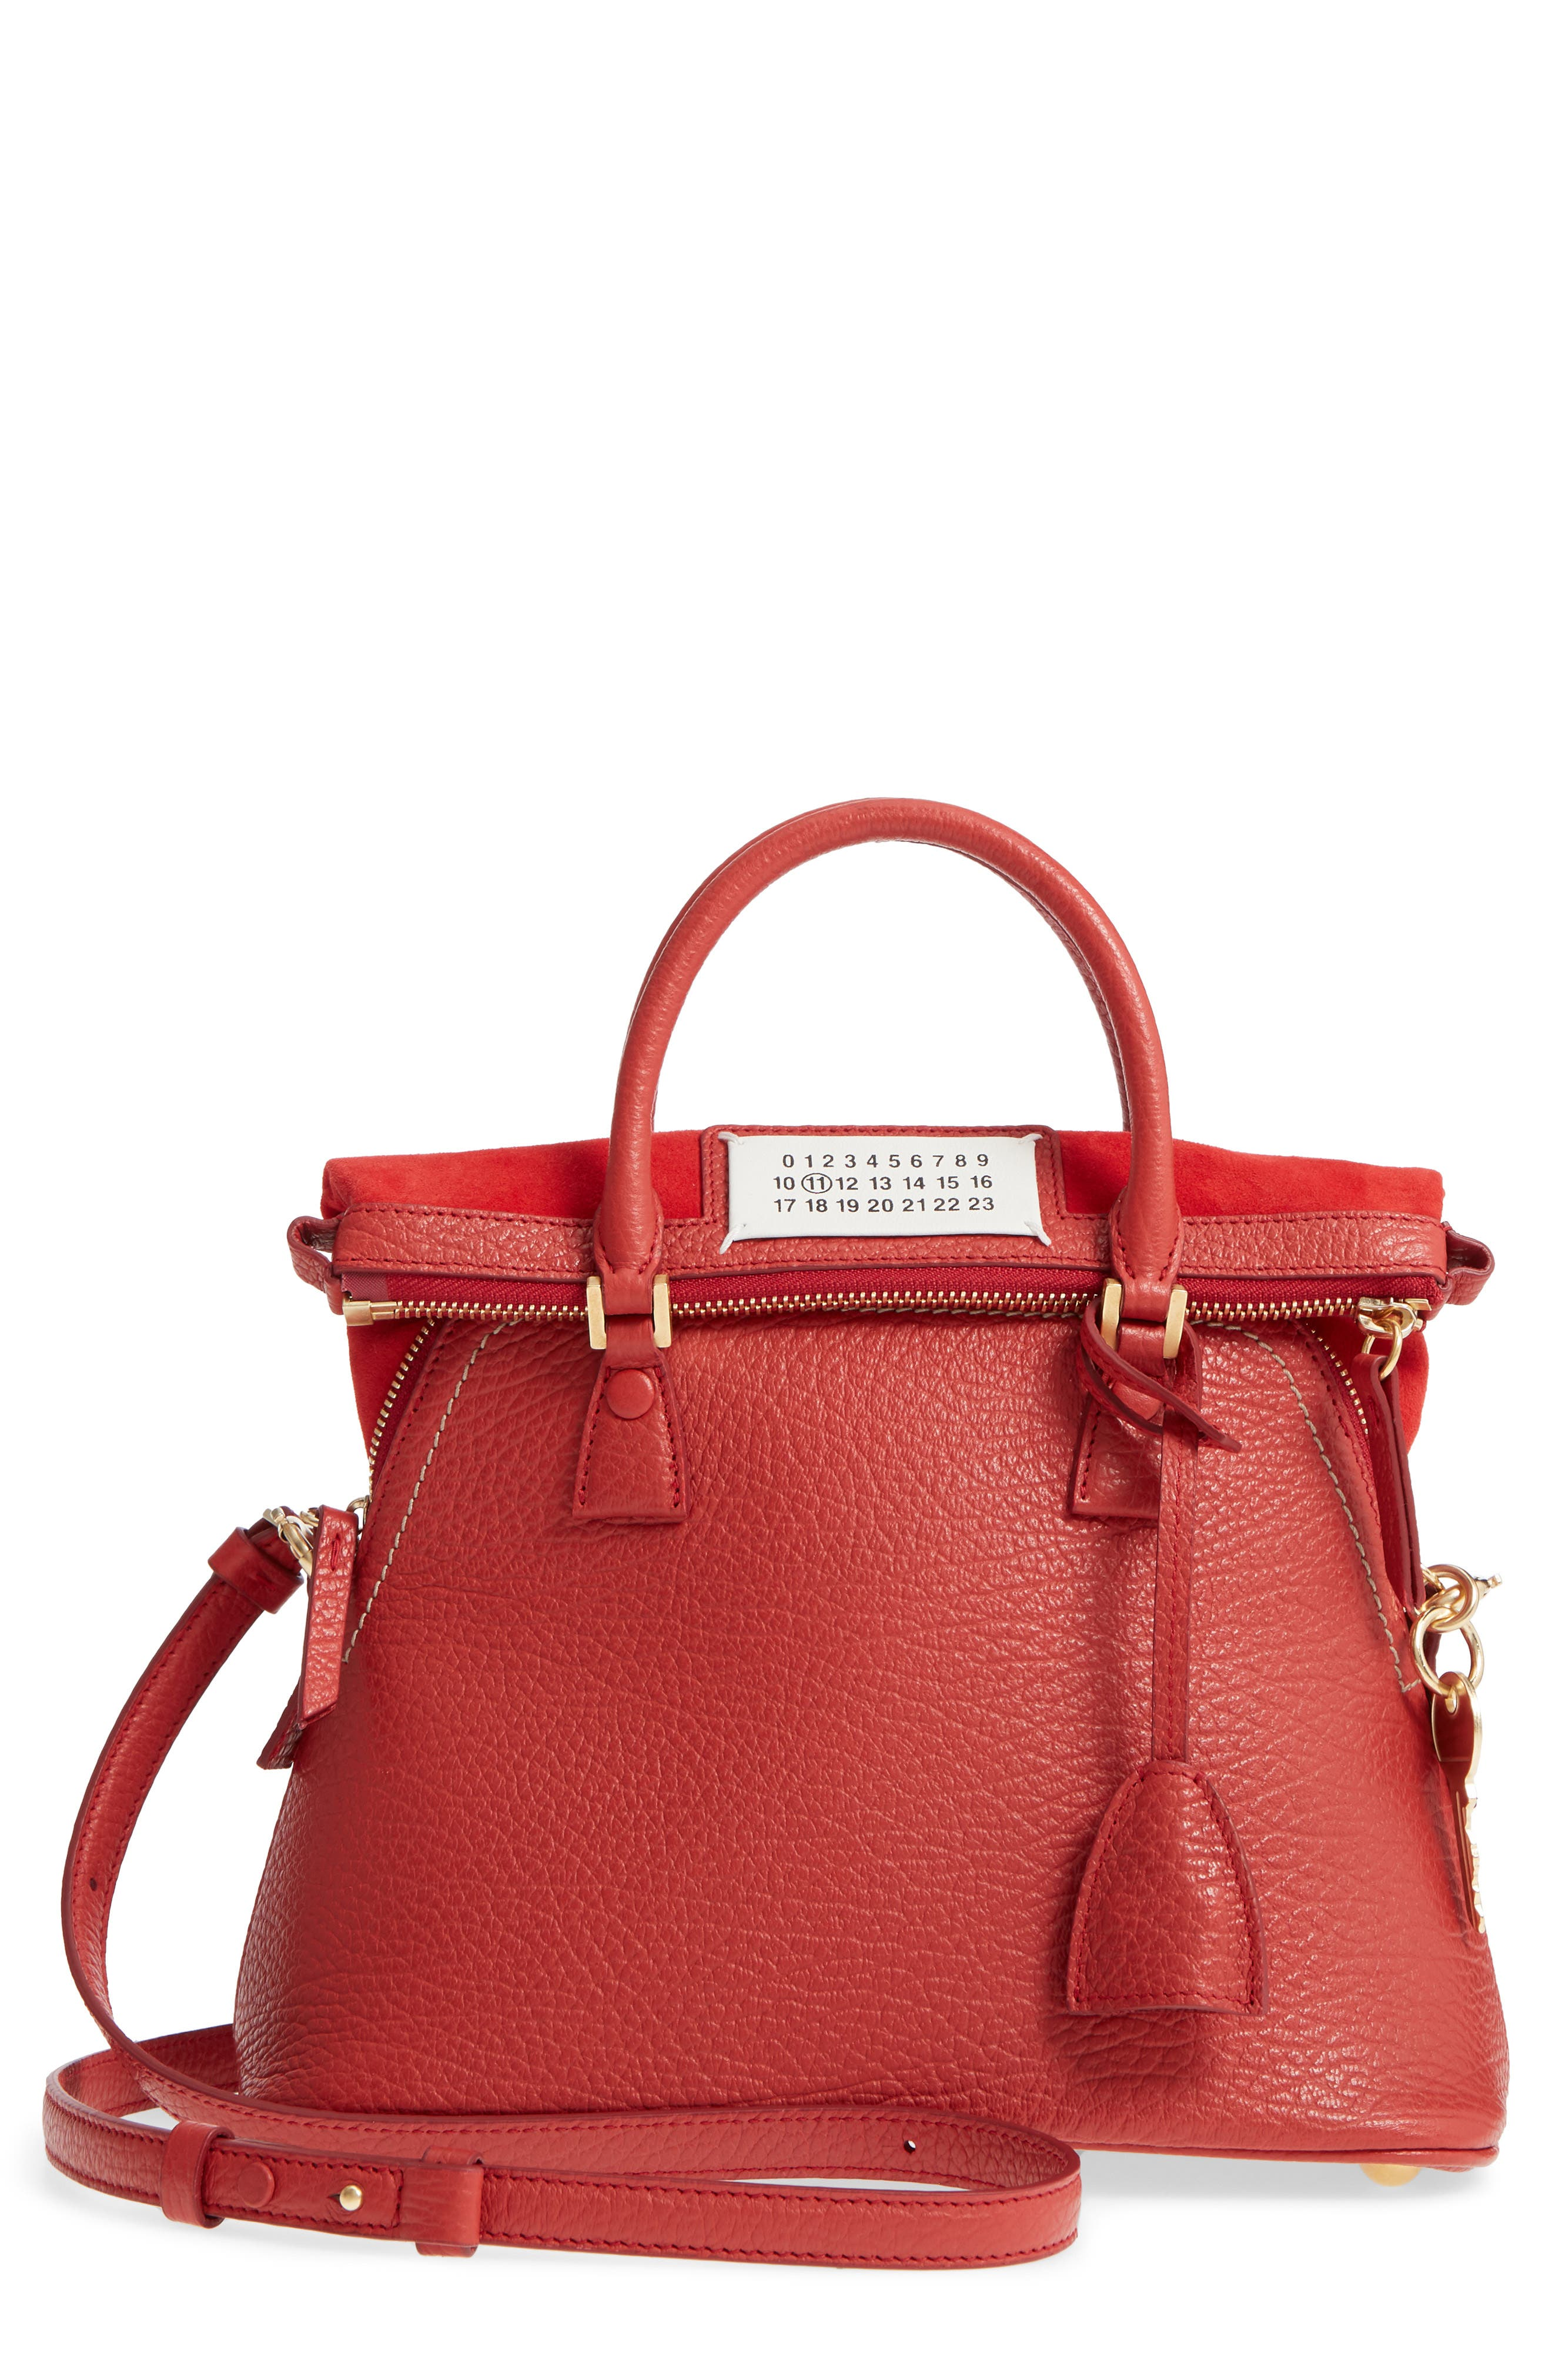 Alternate Image 1 Selected - Maison Margiela Small 5AC Calfskin Leather Handbag